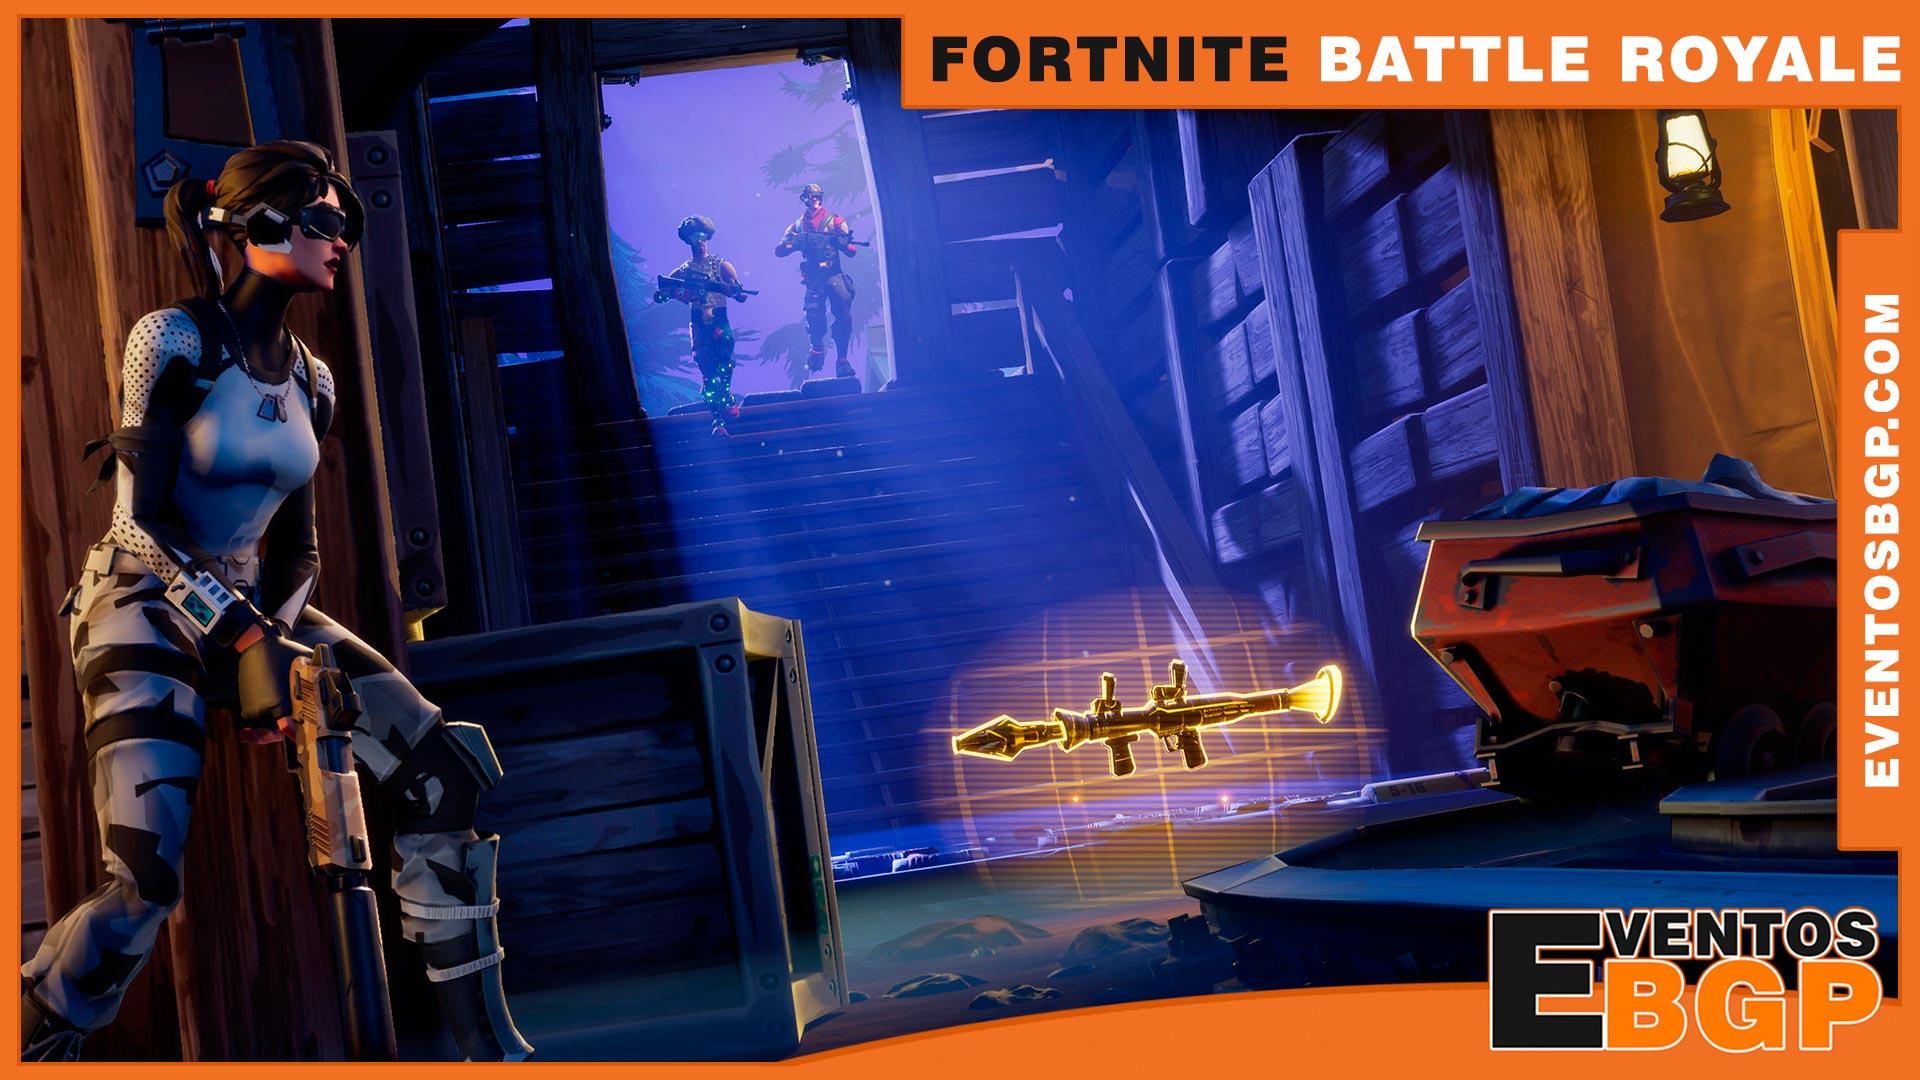 Fortnite Battle Royale [videojuegos] - Couverture Facebook Fortnite , HD Wallpaper & Backgrounds